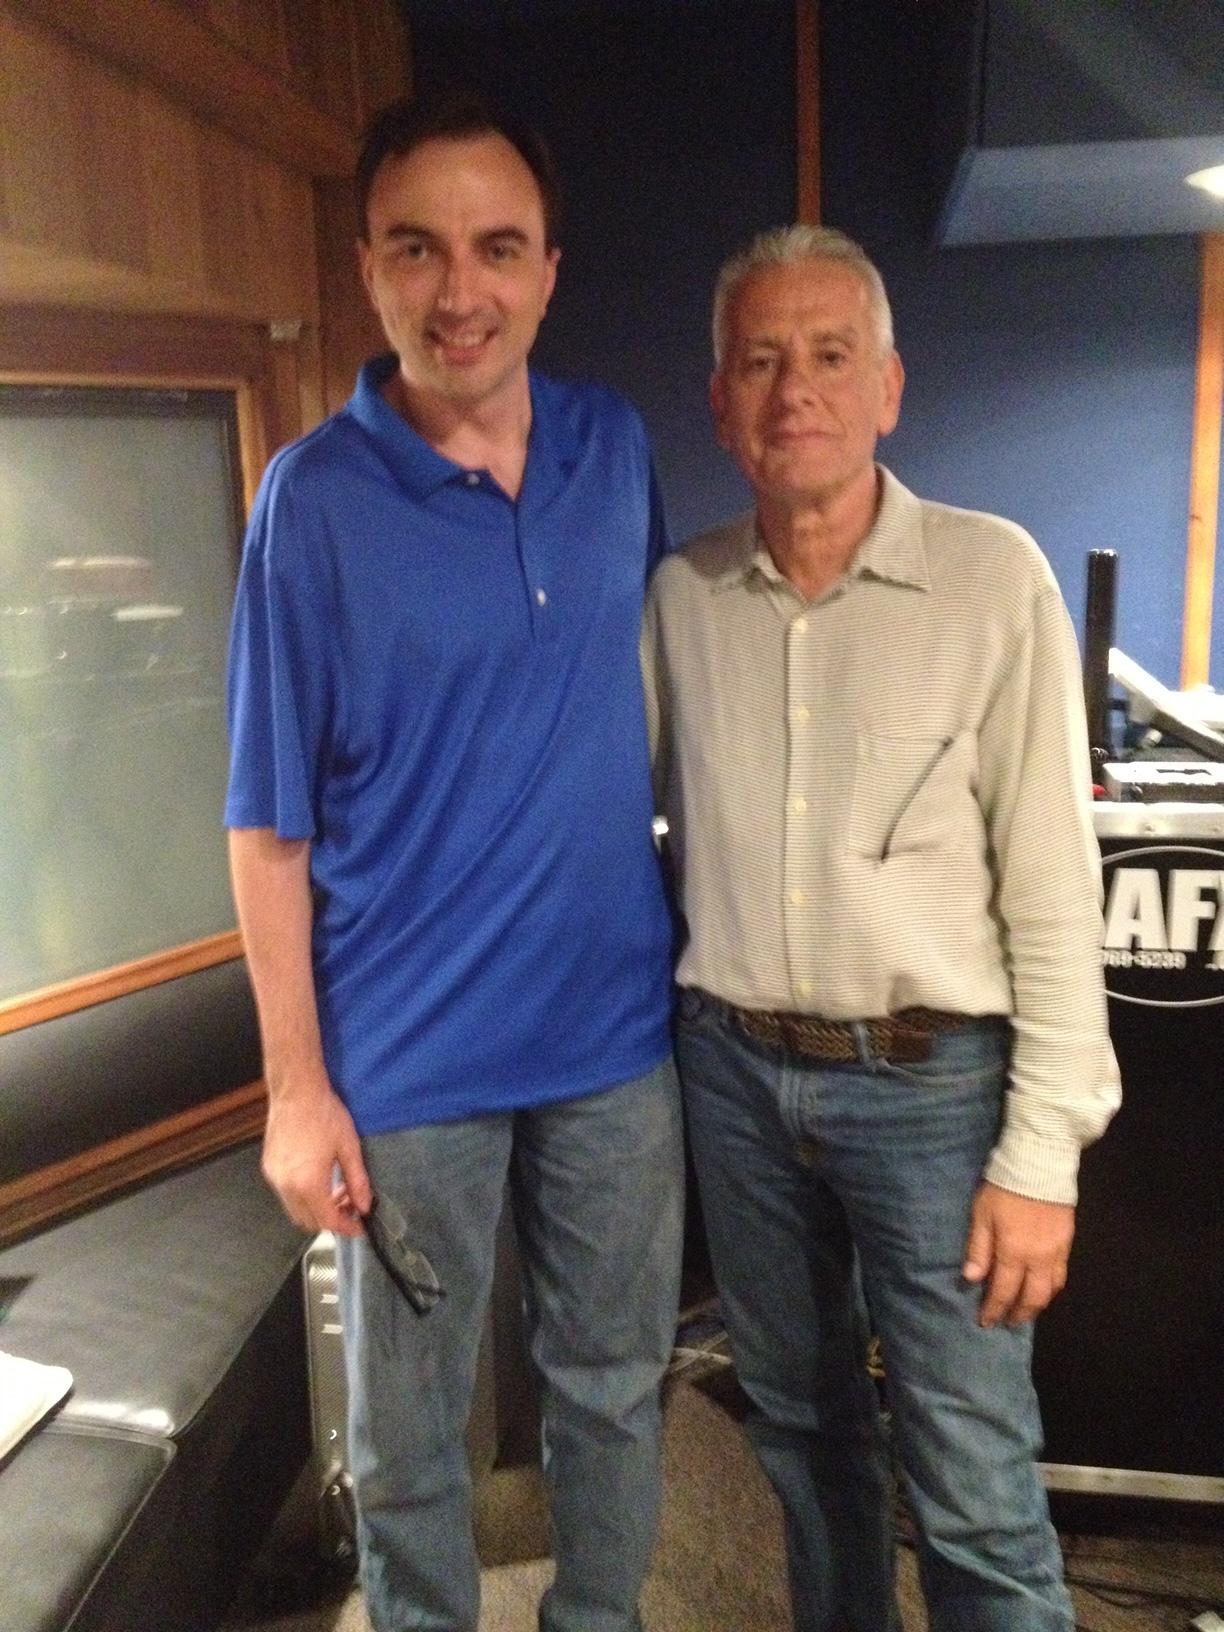 Studio legend, Jerry Hey